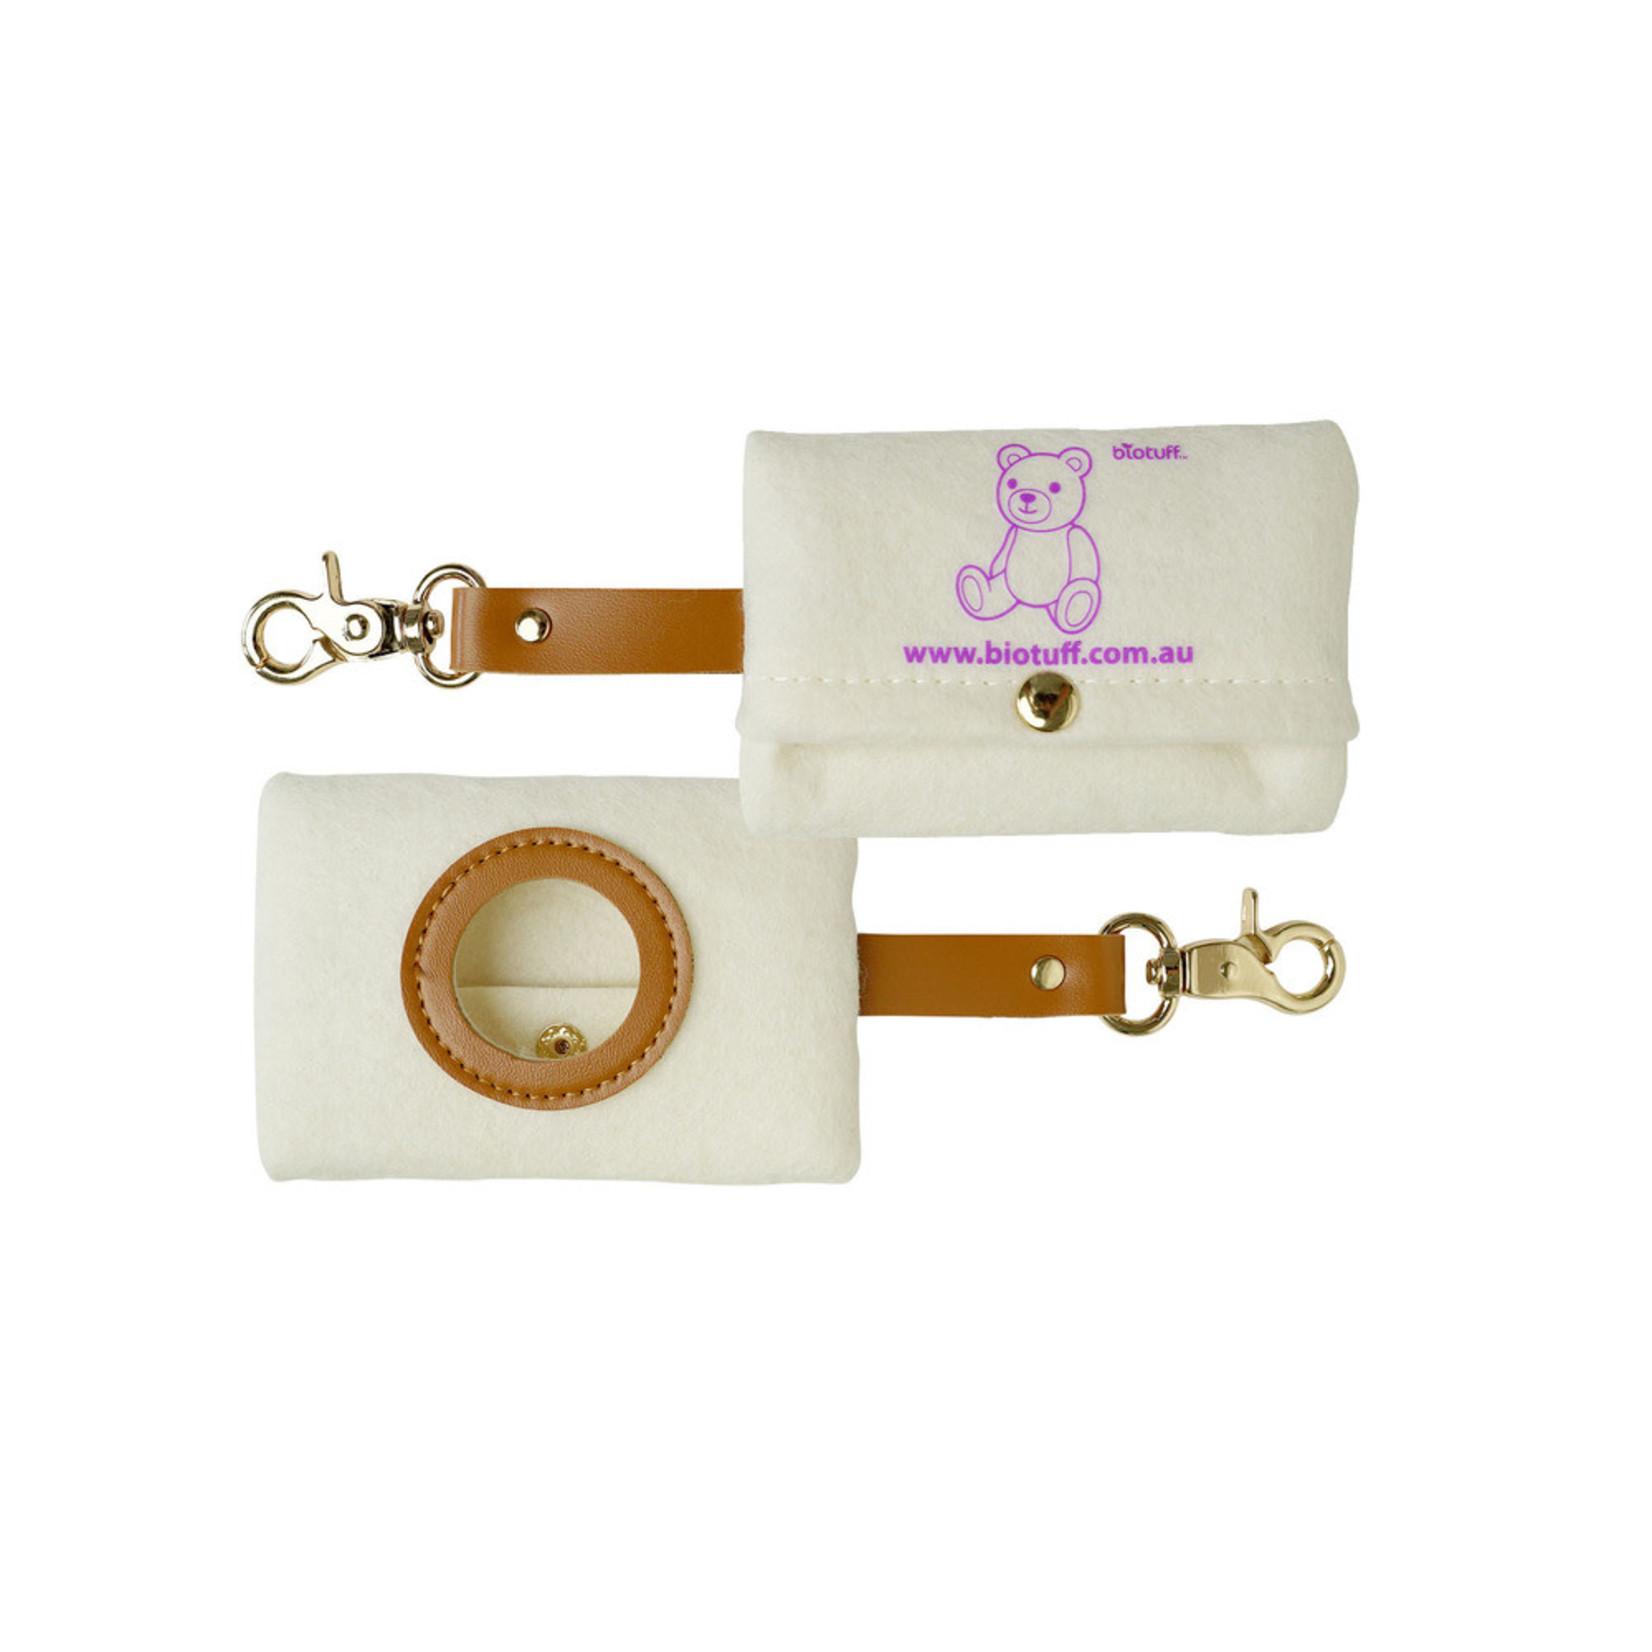 Biotuff Biotuff Nappy Bags & Dispenser (4x10)